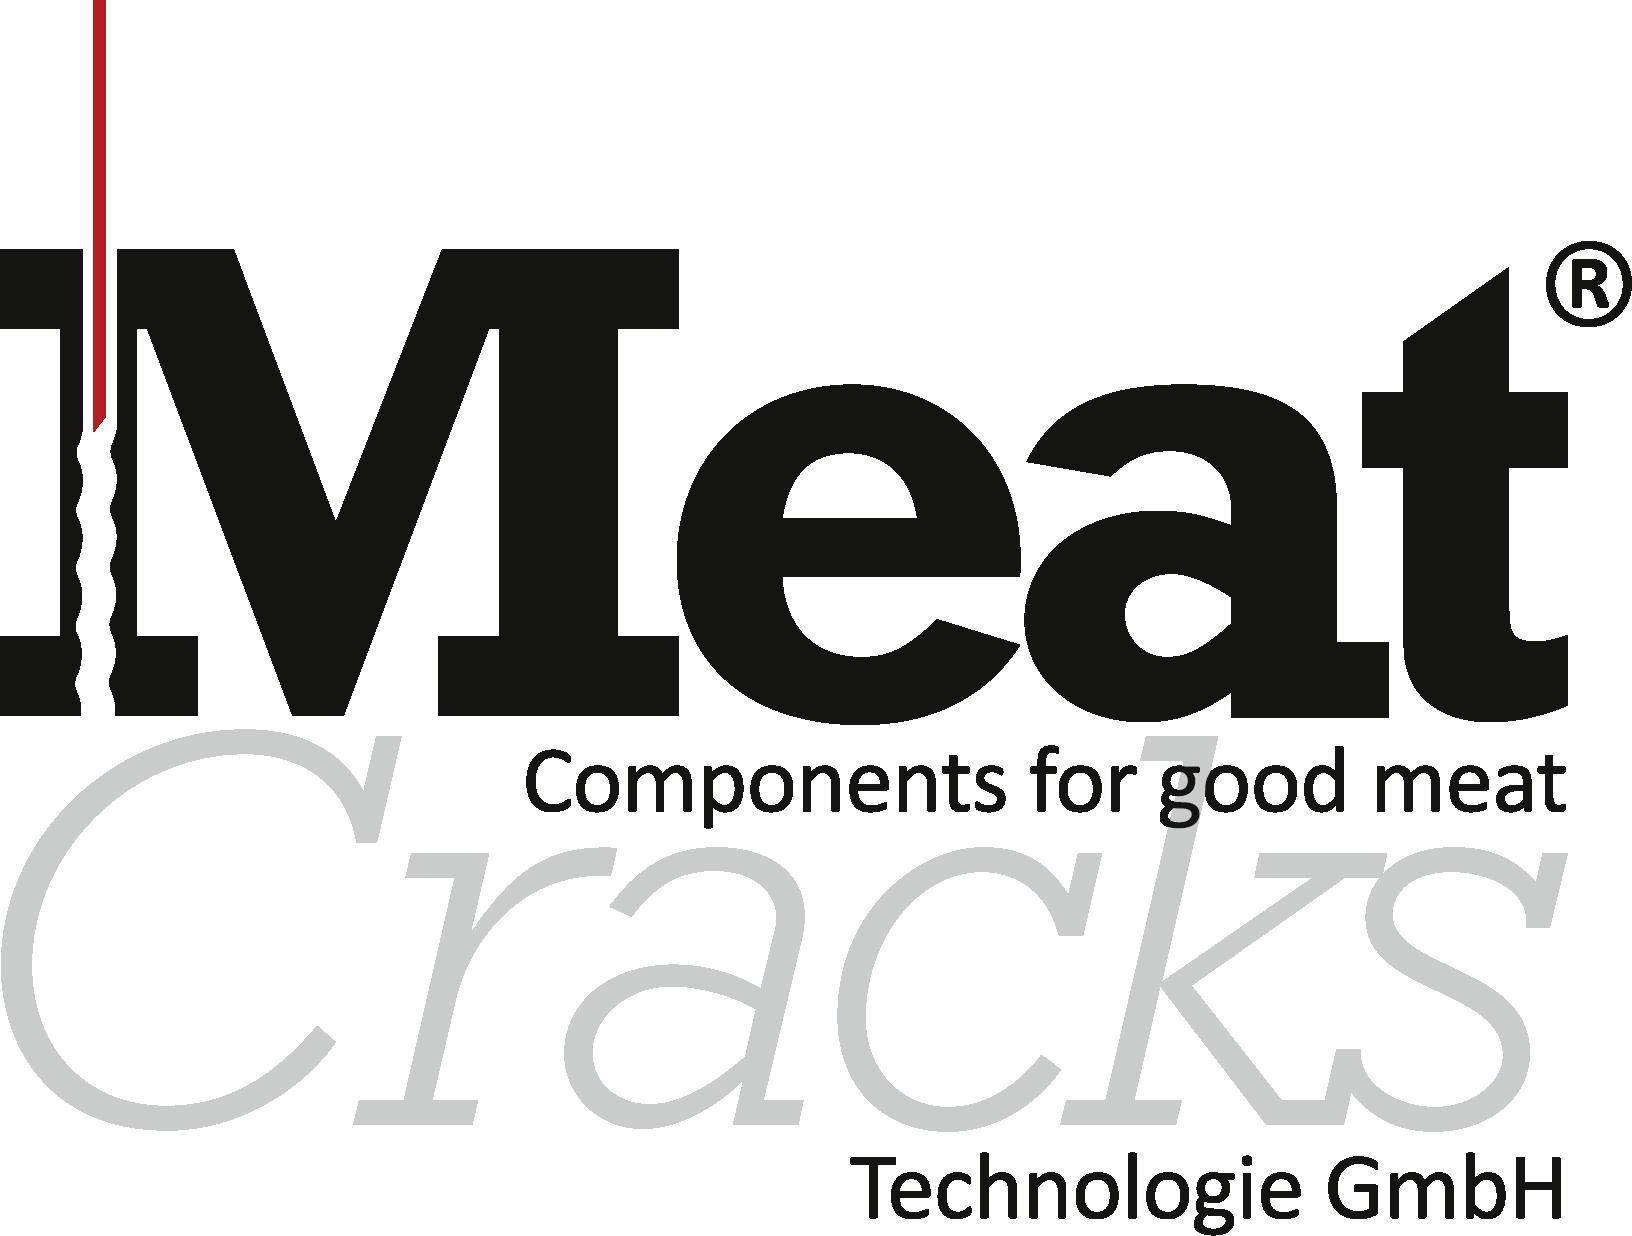 Meat Cracks Technologie GmbH